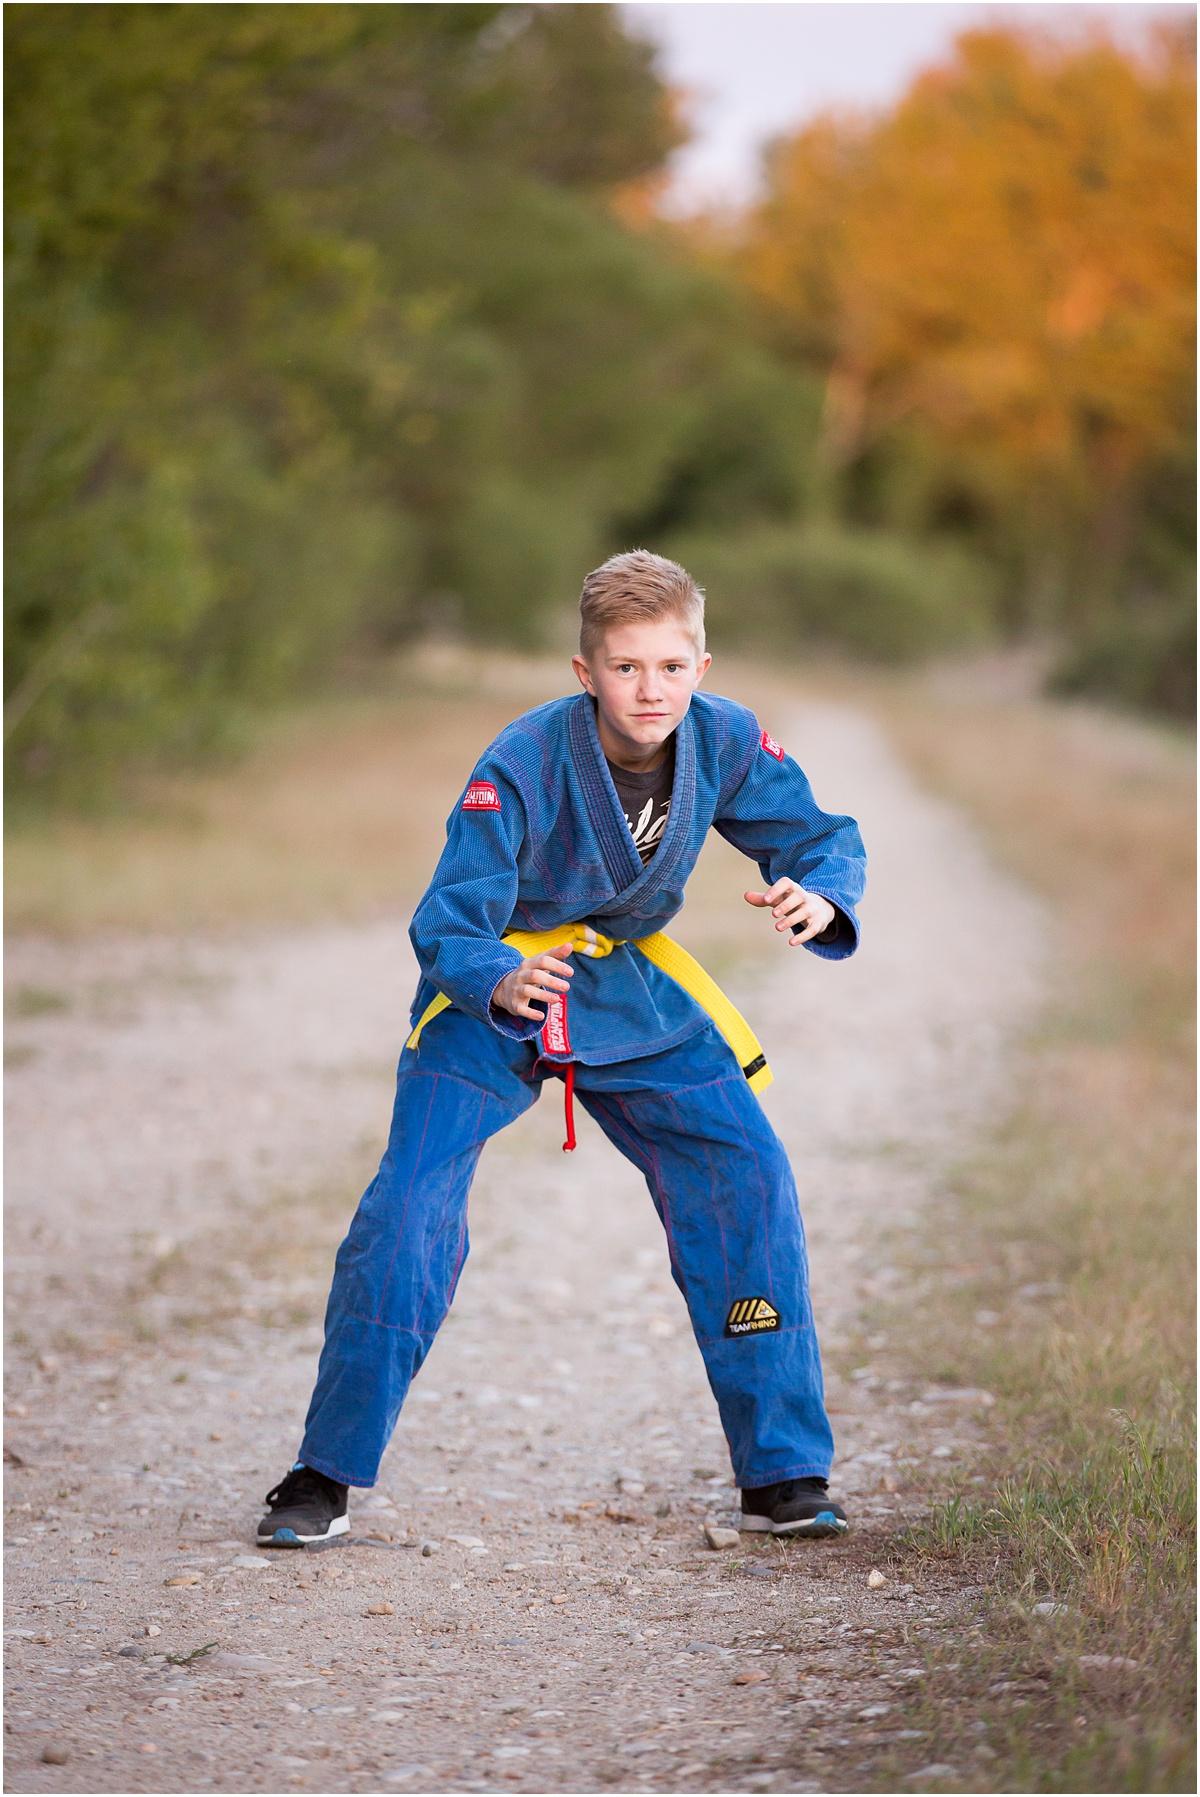 Portraits_Child Photography_Meridian Idaho__Leah Southwick Photography_0062.jpg